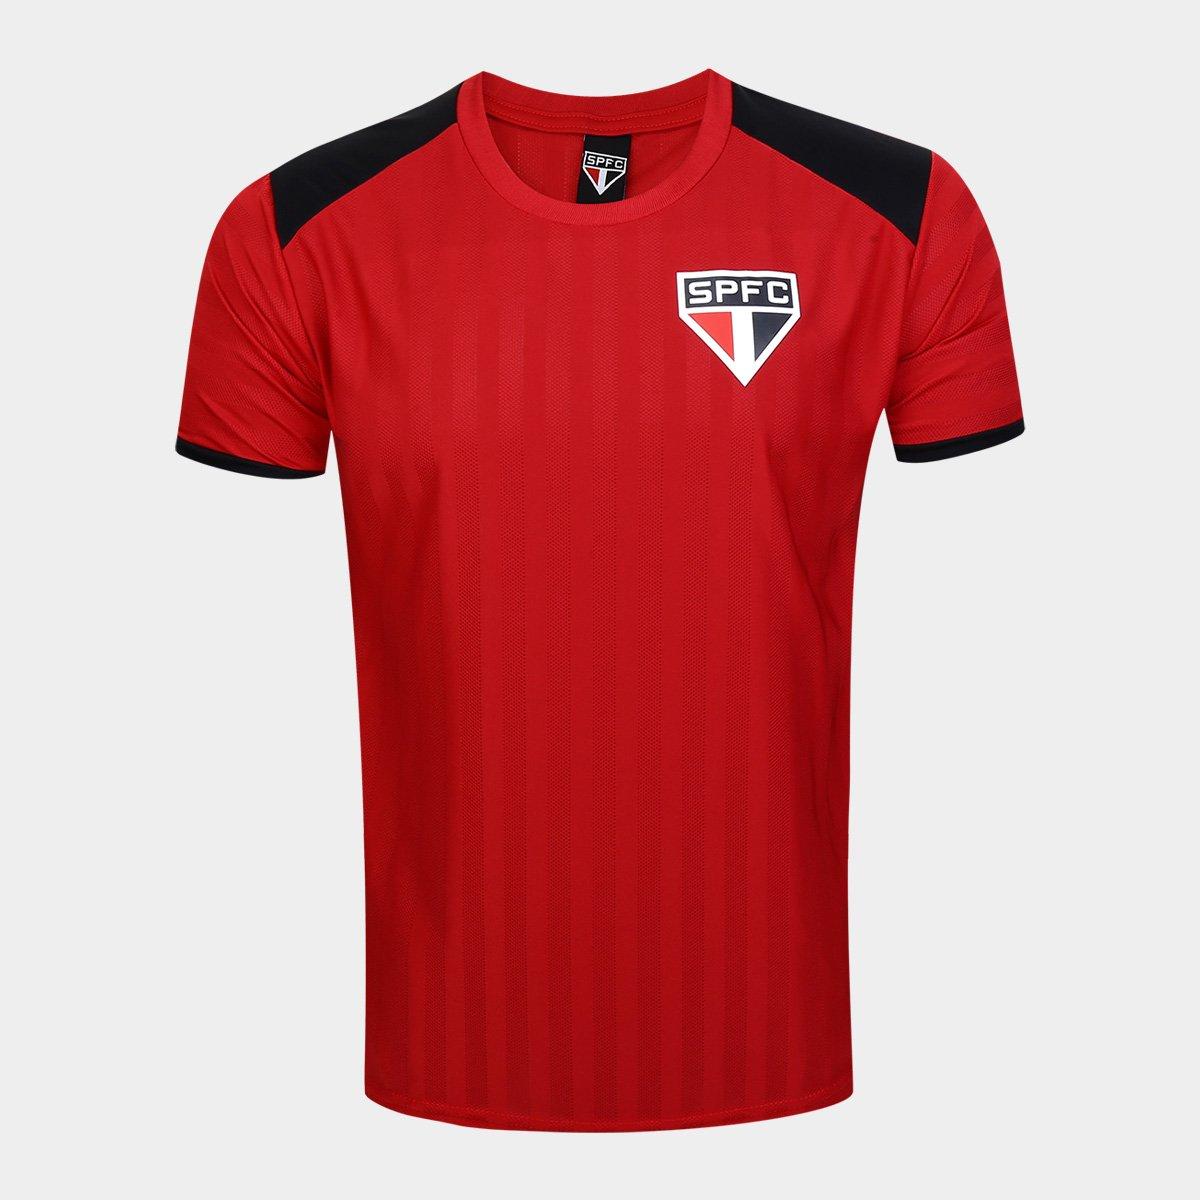 Camisa São Paulo base 2003 SPR